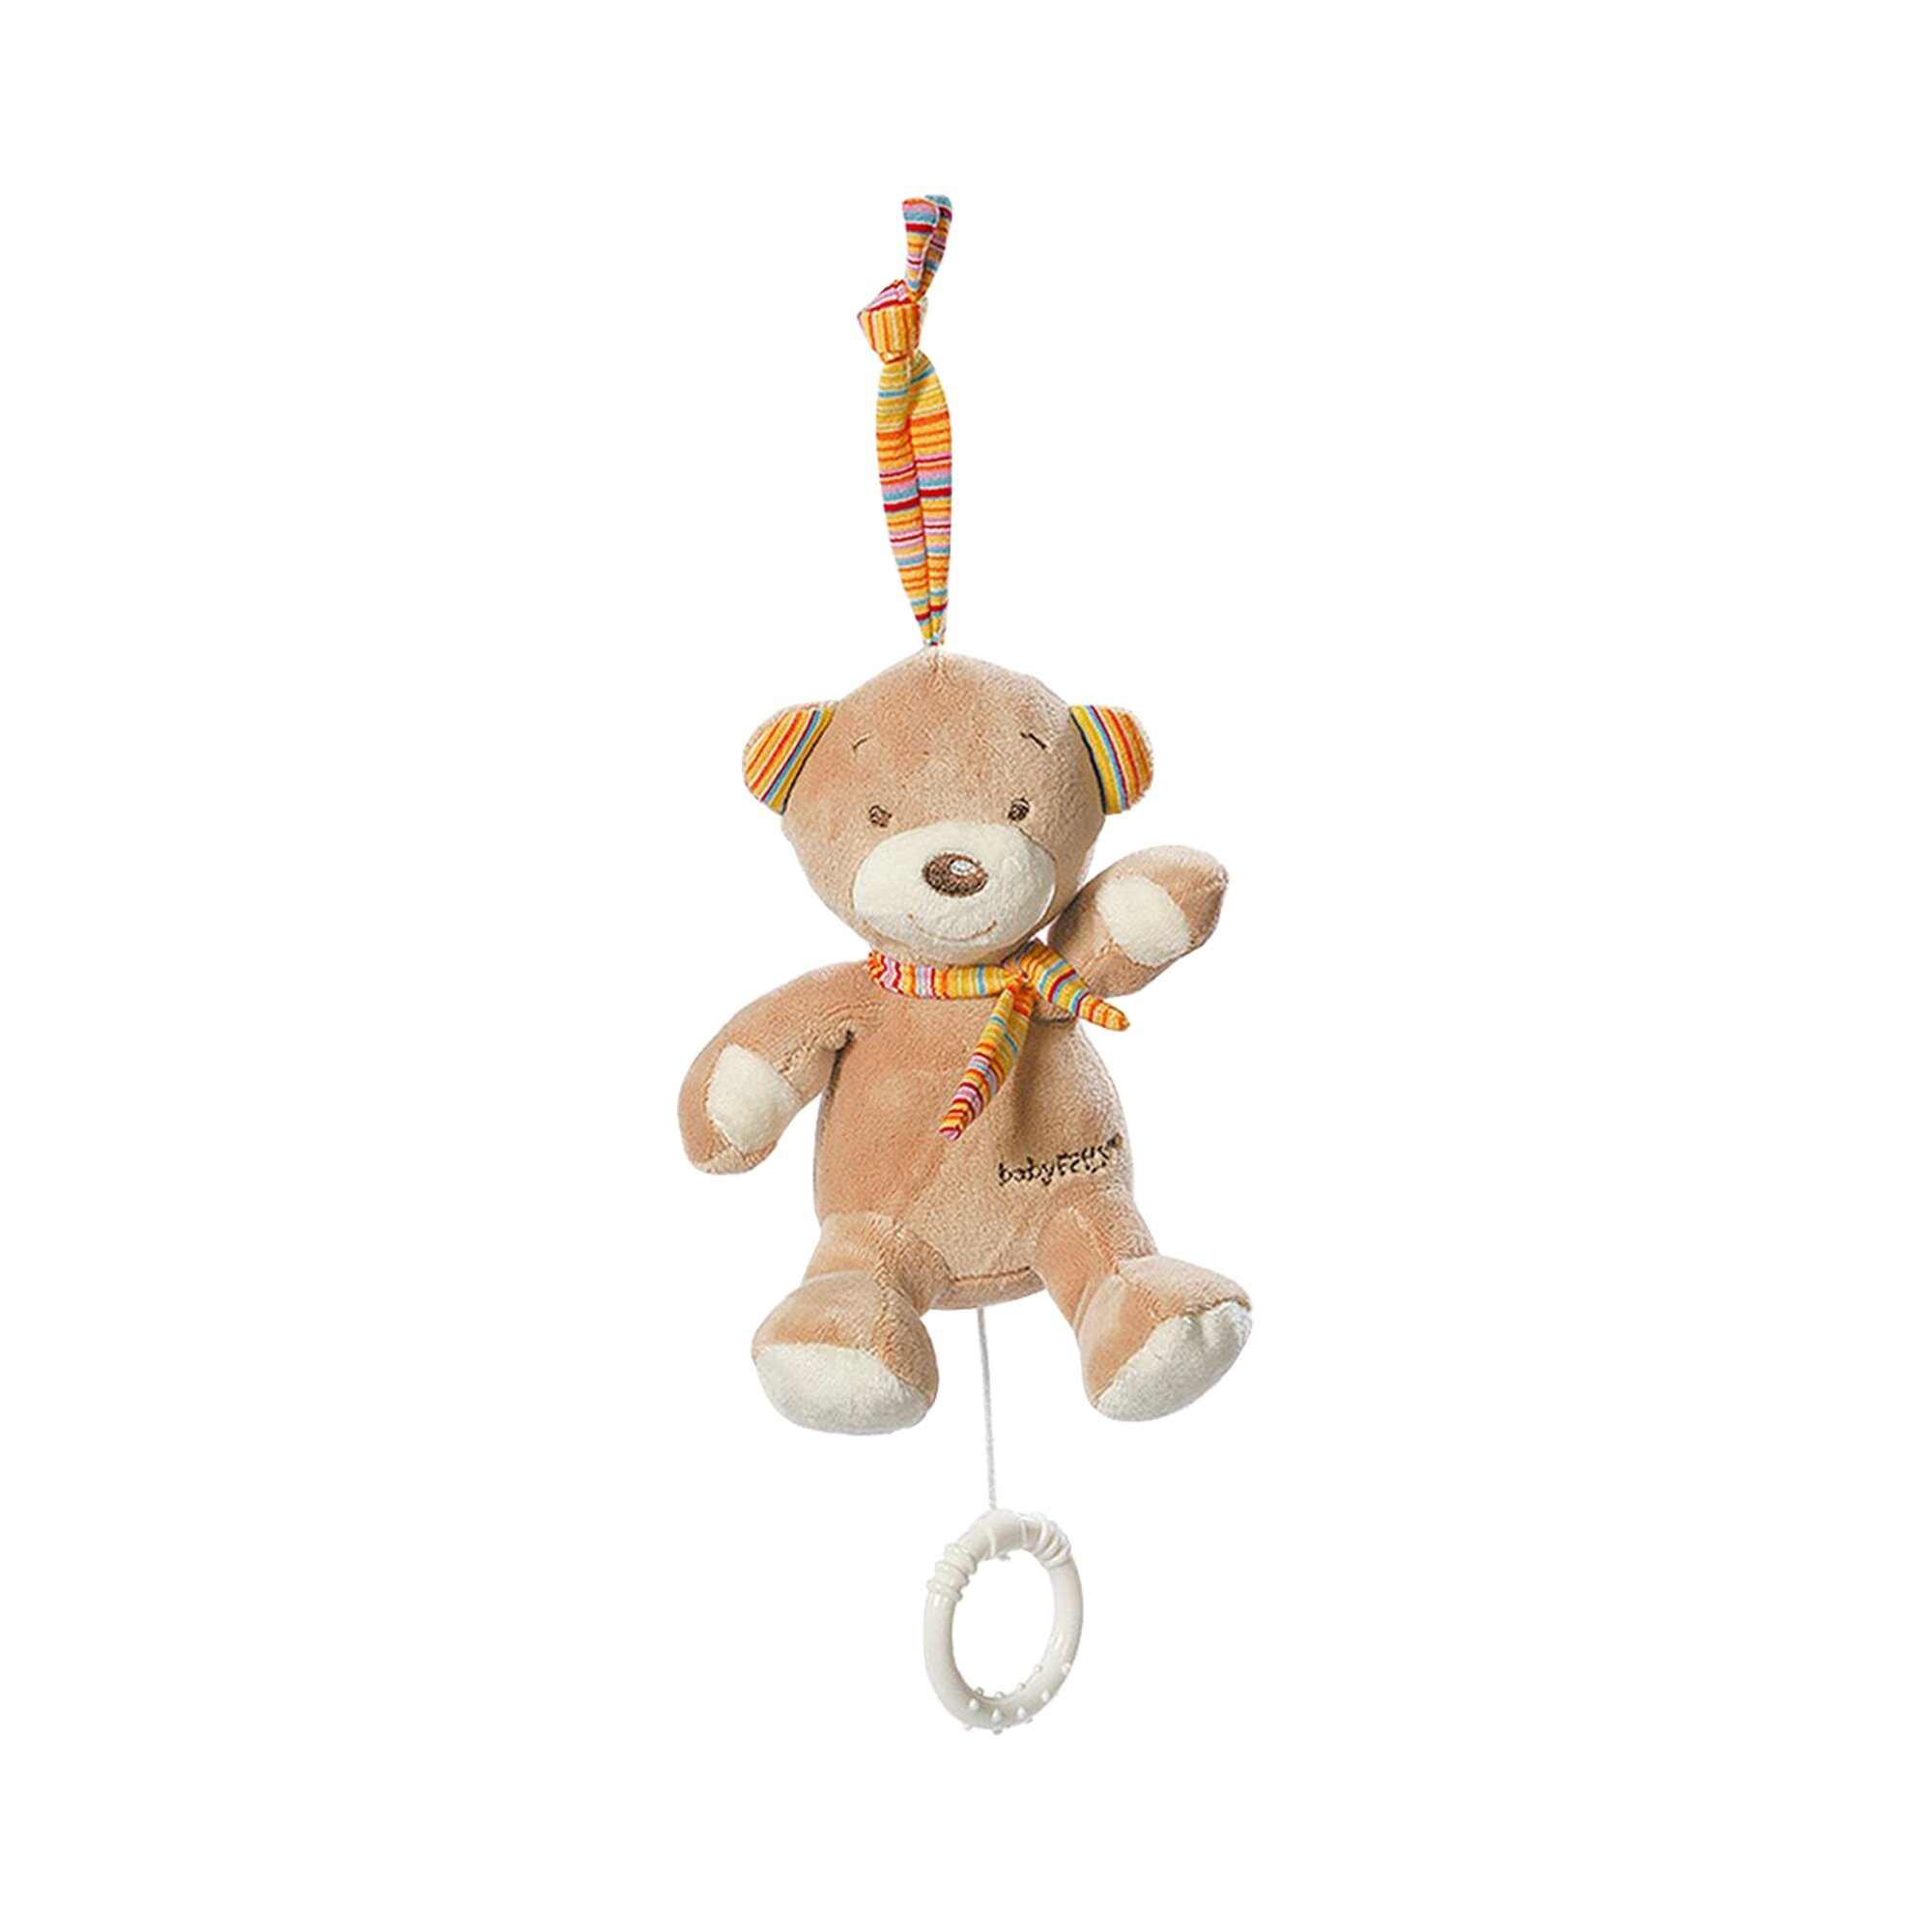 Fehn Spieluhr Teddy Rainbow 16 cm